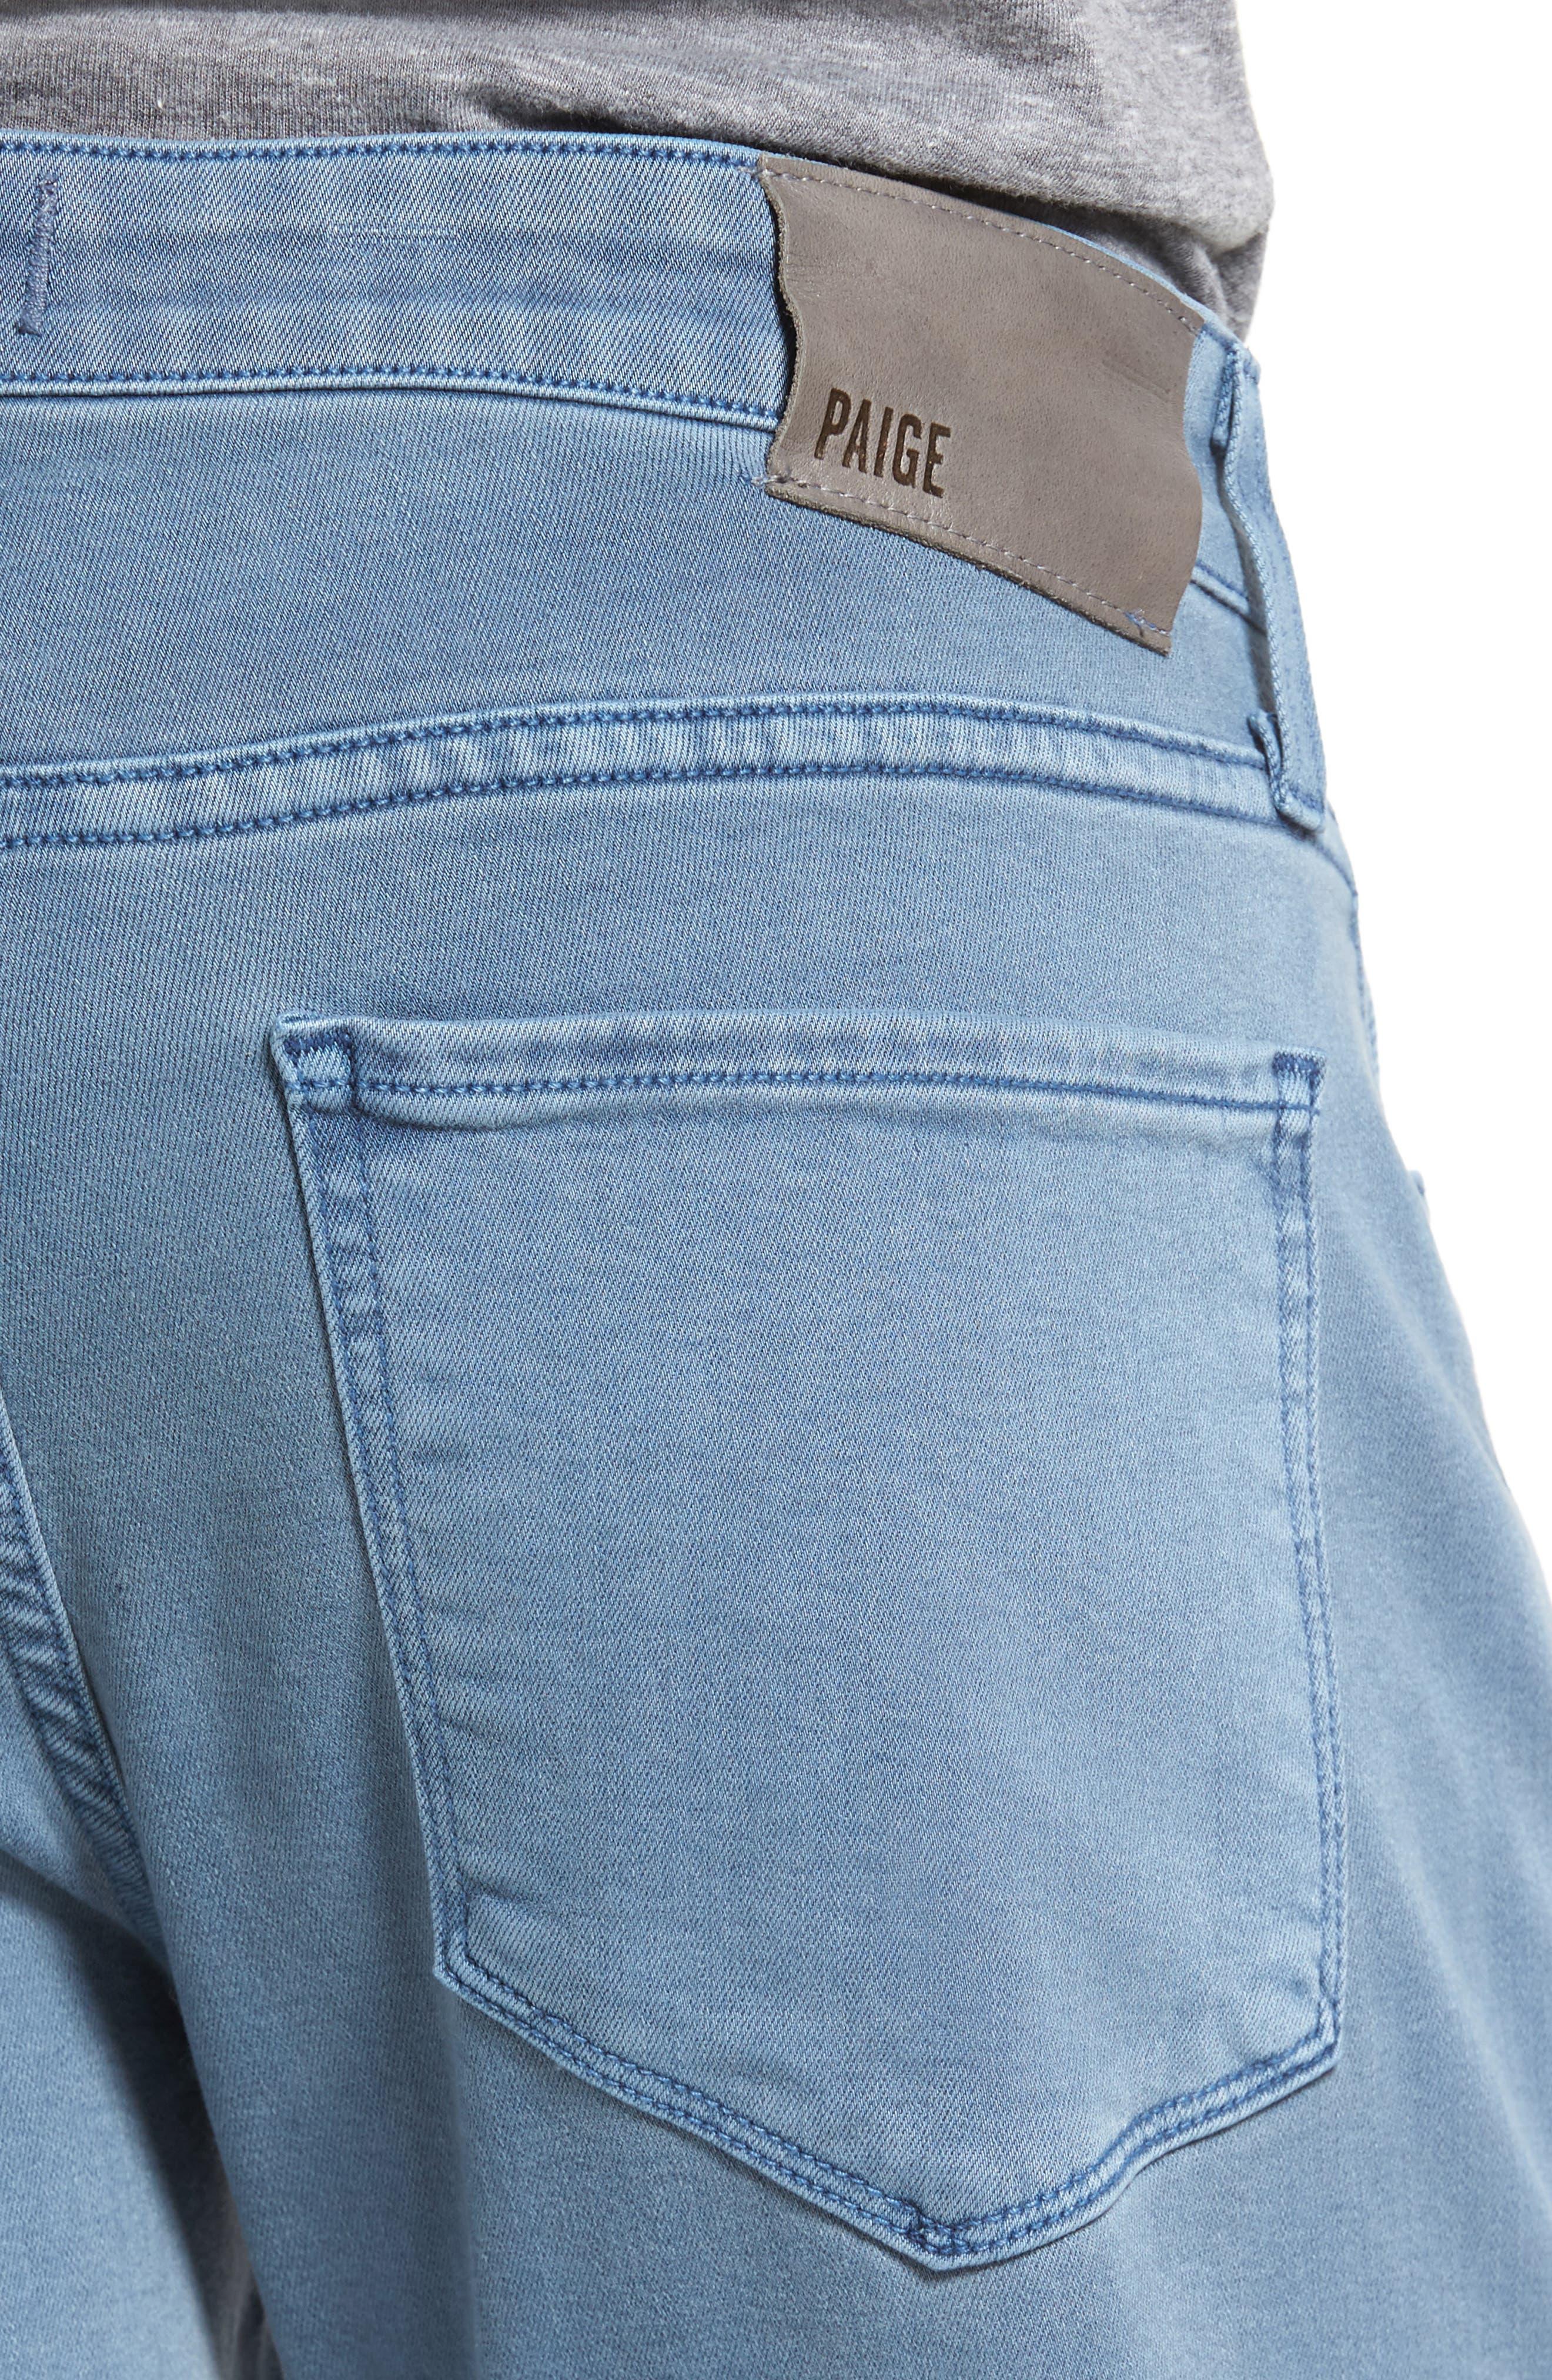 Transcend - Lennox Slim Fit Jeans,                             Alternate thumbnail 4, color,                             430